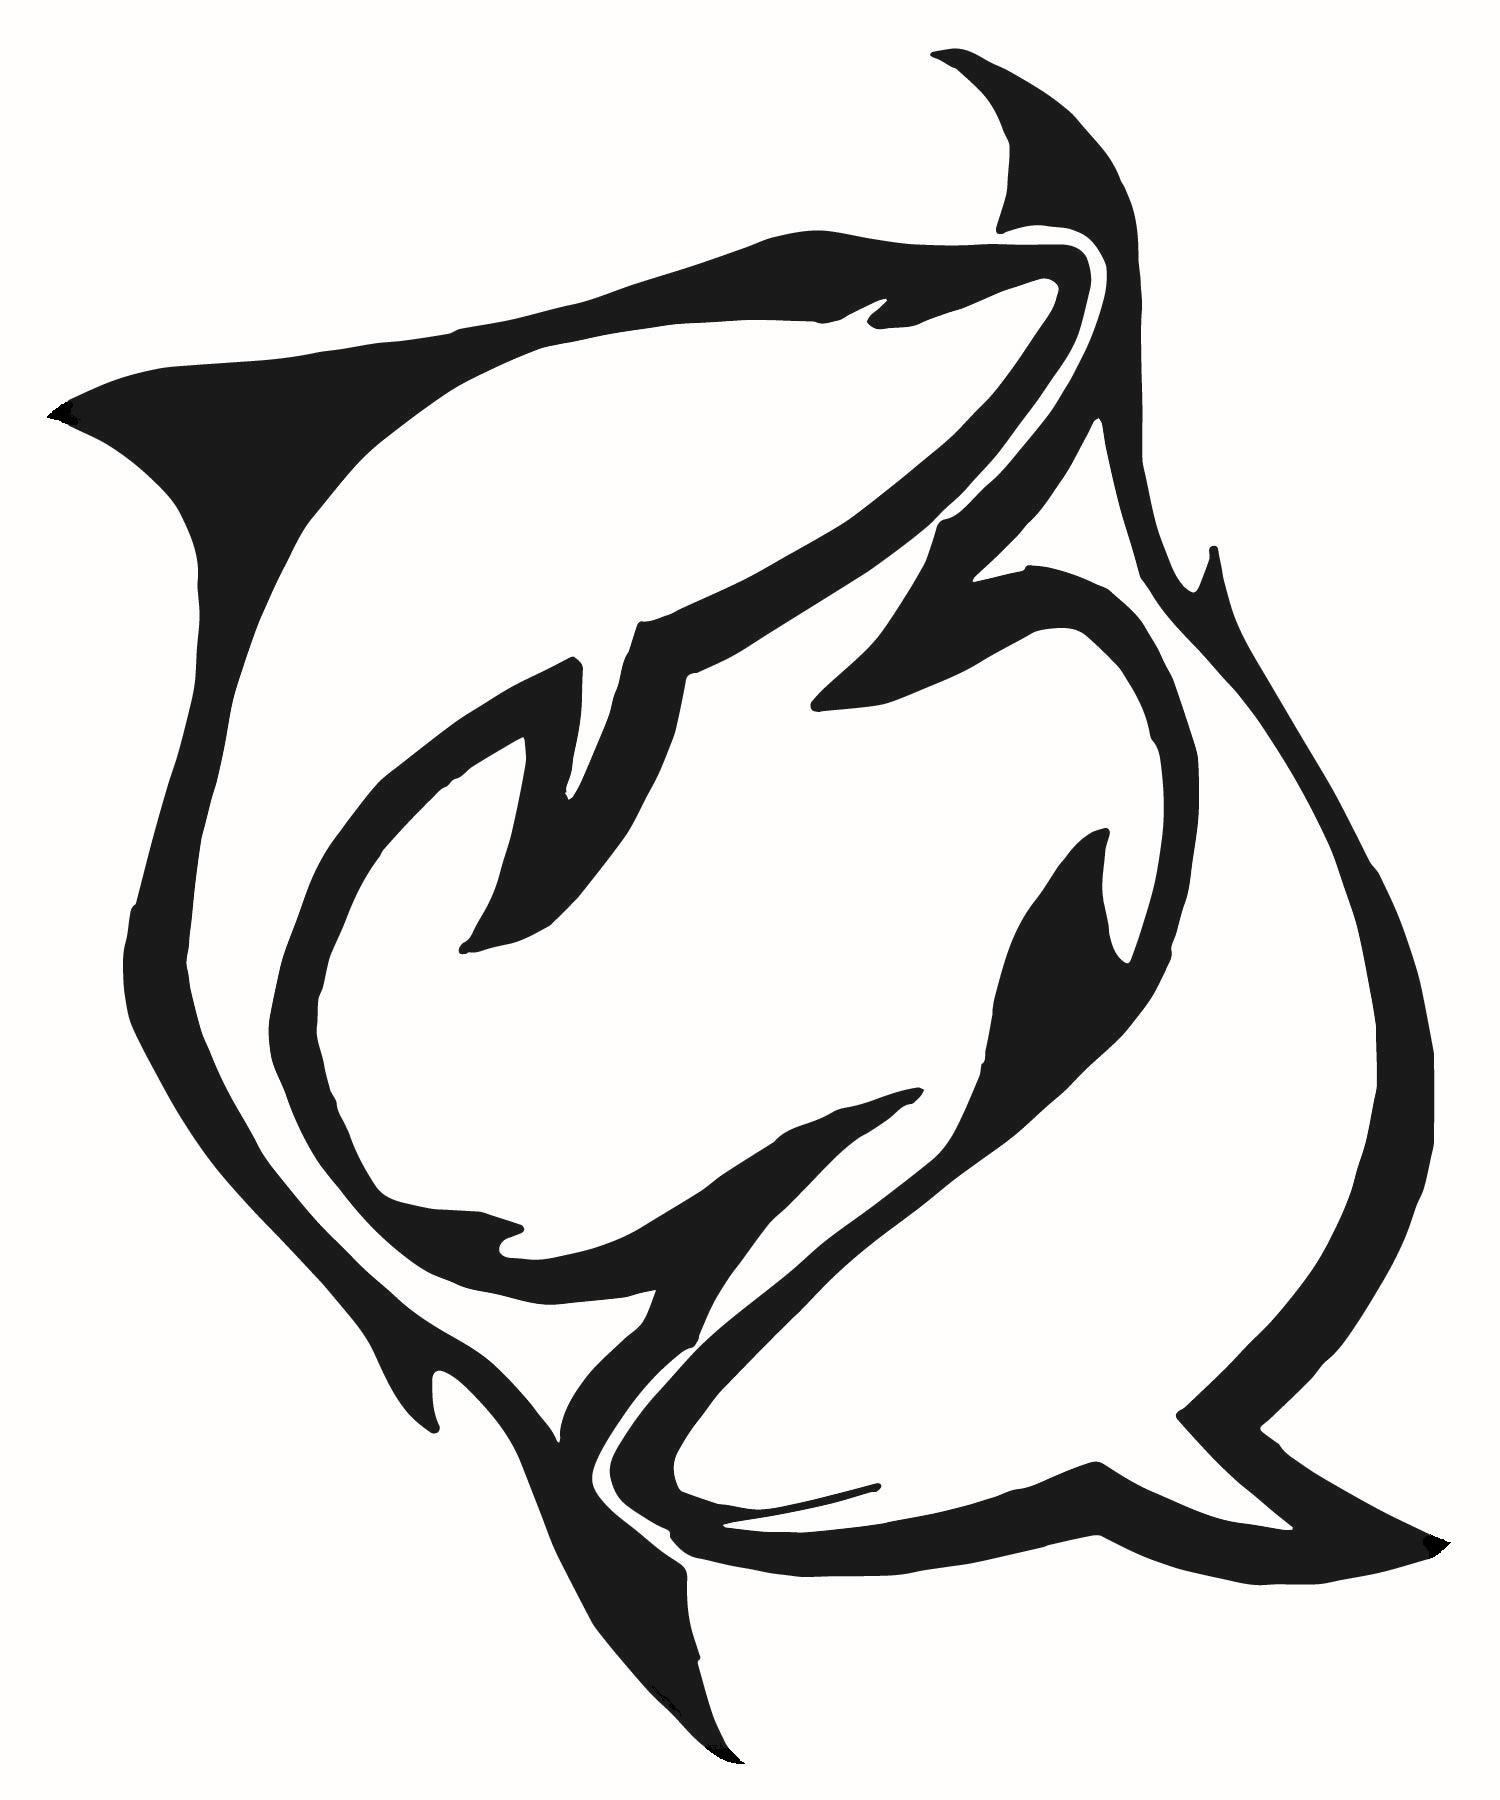 Sharkfinn logo edited.jpg